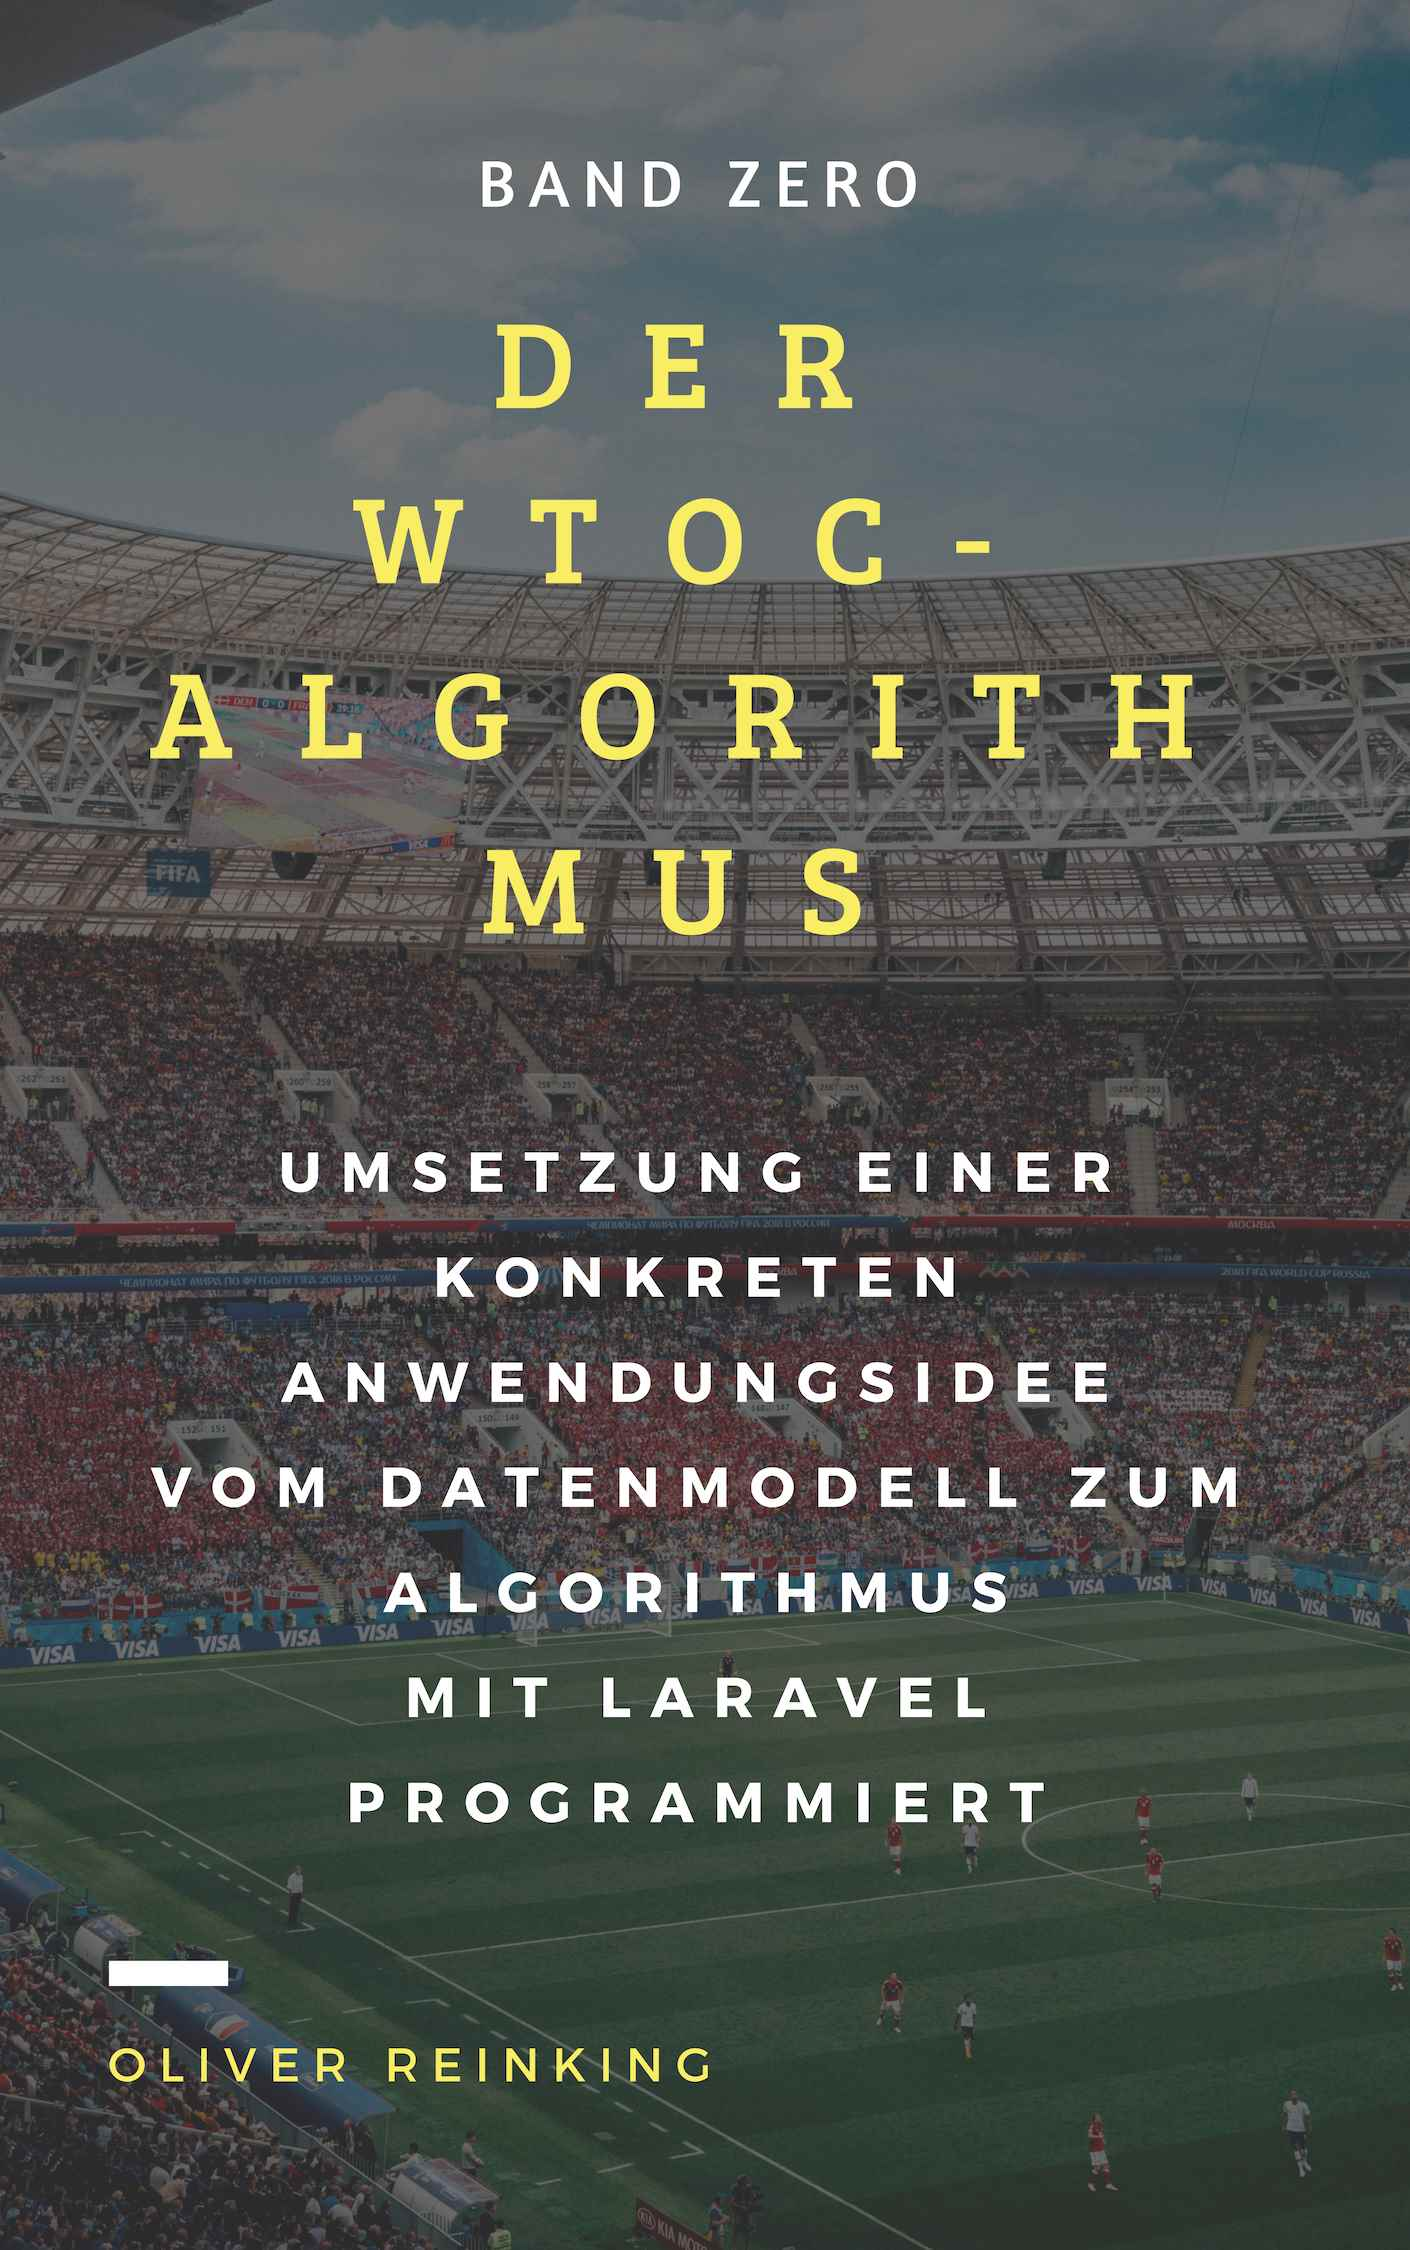 Der WTOC-Algorithmus